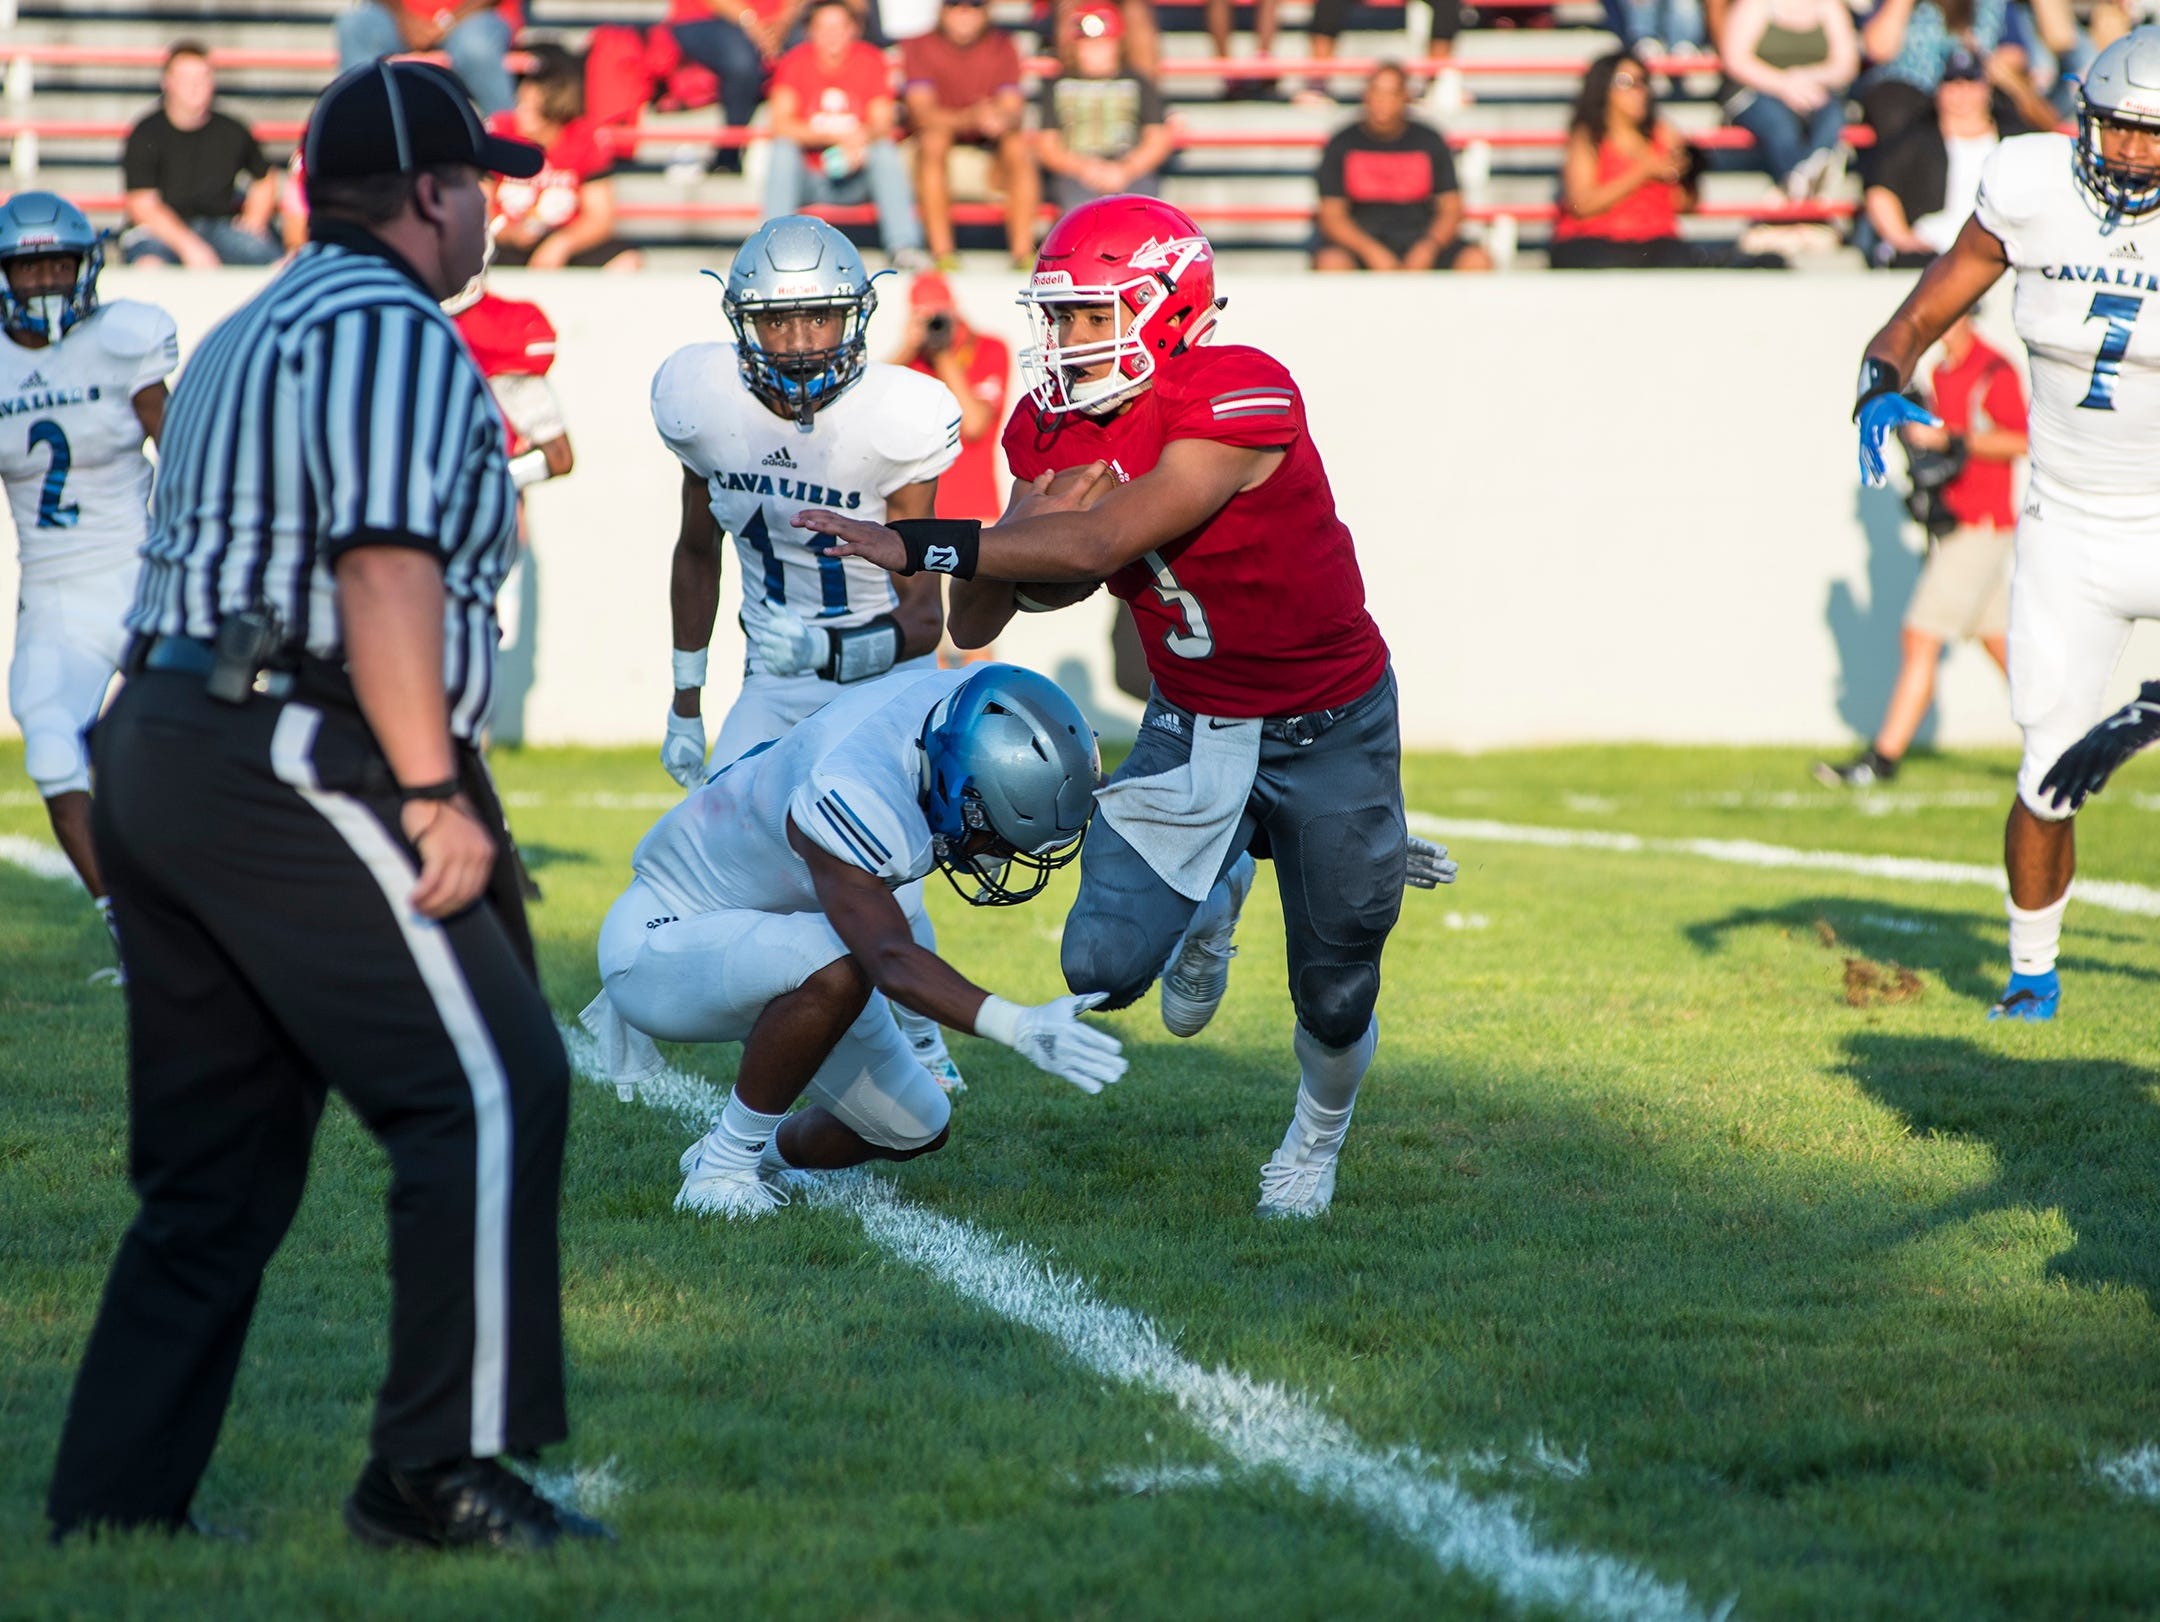 Port Huron High School quarterback Jonny Oriel runs the ball during their game against Carman-Ainsworth High School Thursday, Aug. 23, 2018, at Memorial Stadium.